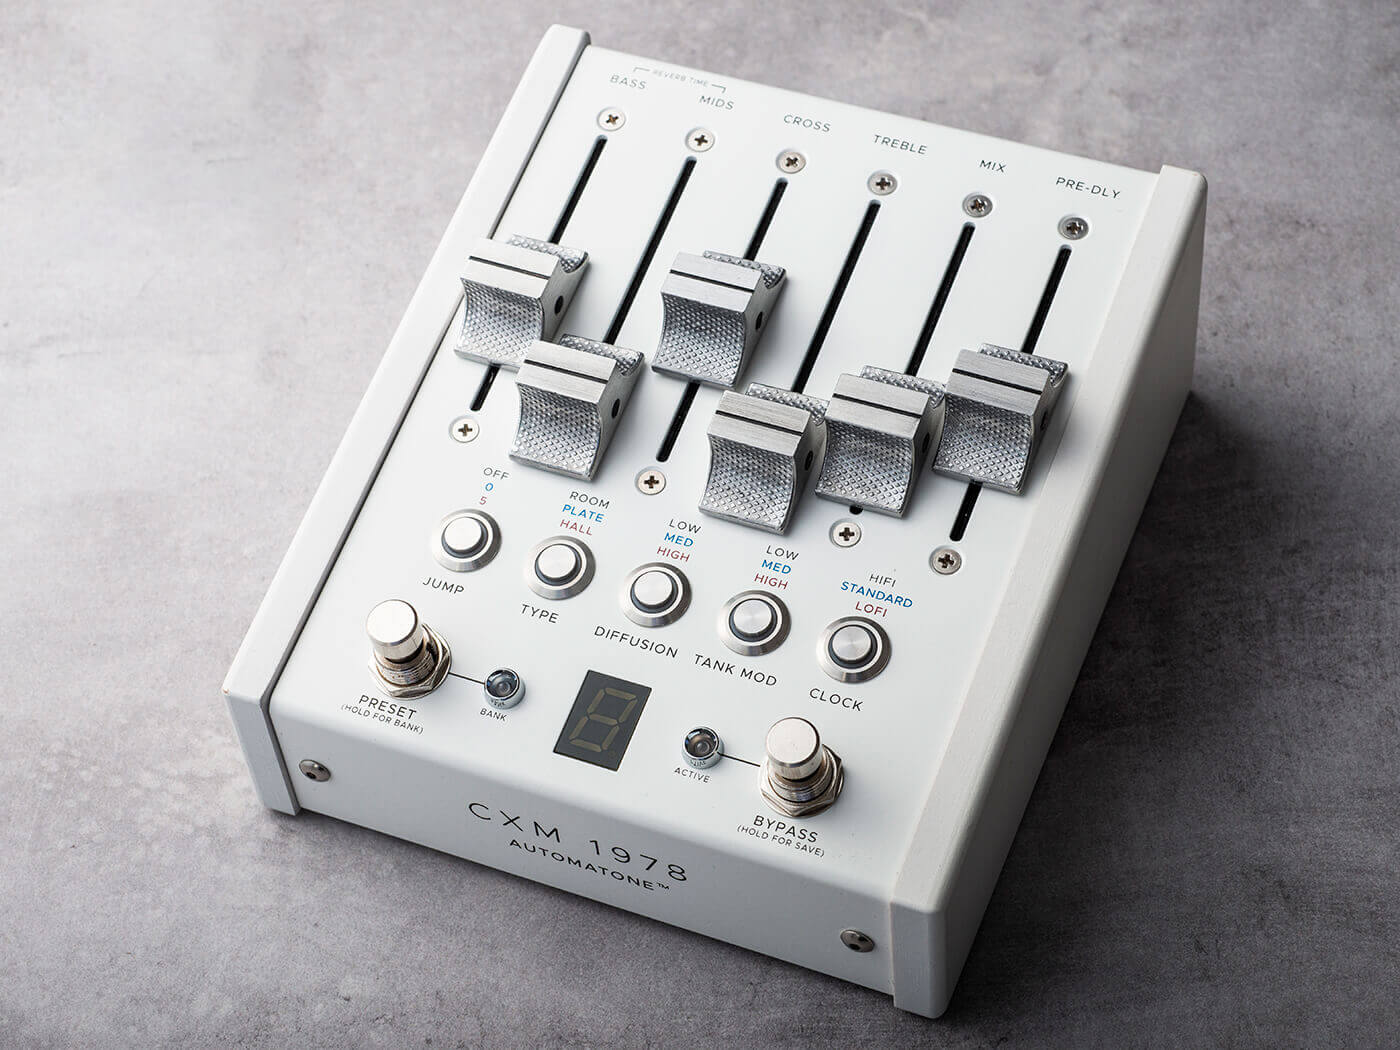 Chase Bliss Audio Automatone CXM 1978